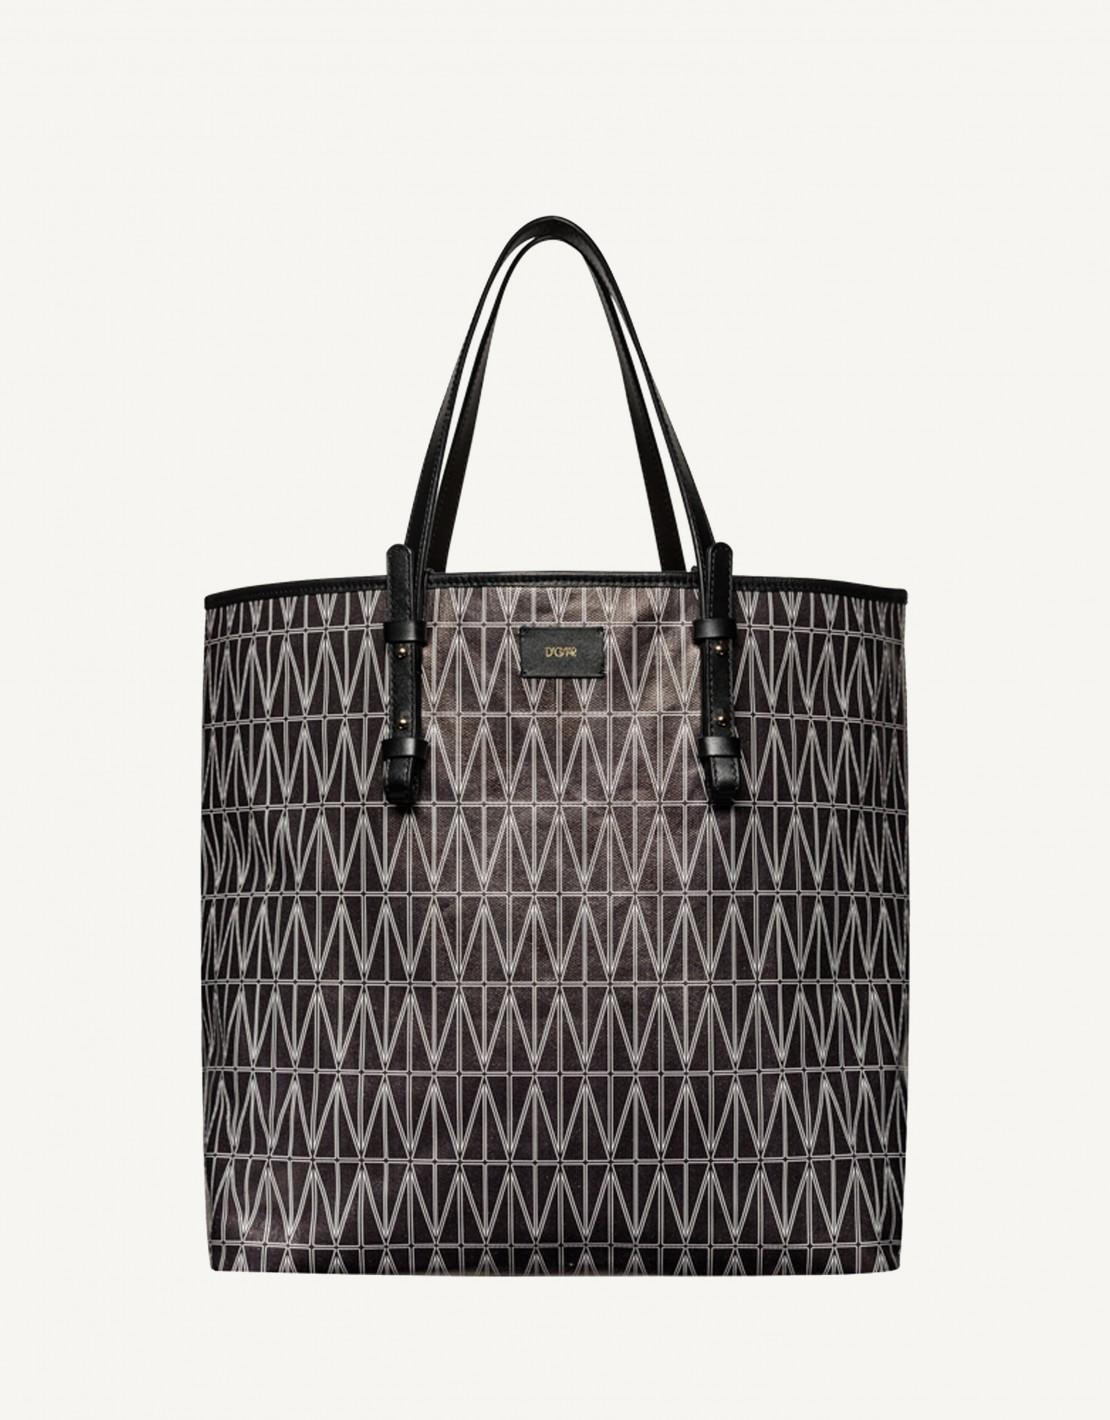 shoppingbag-black